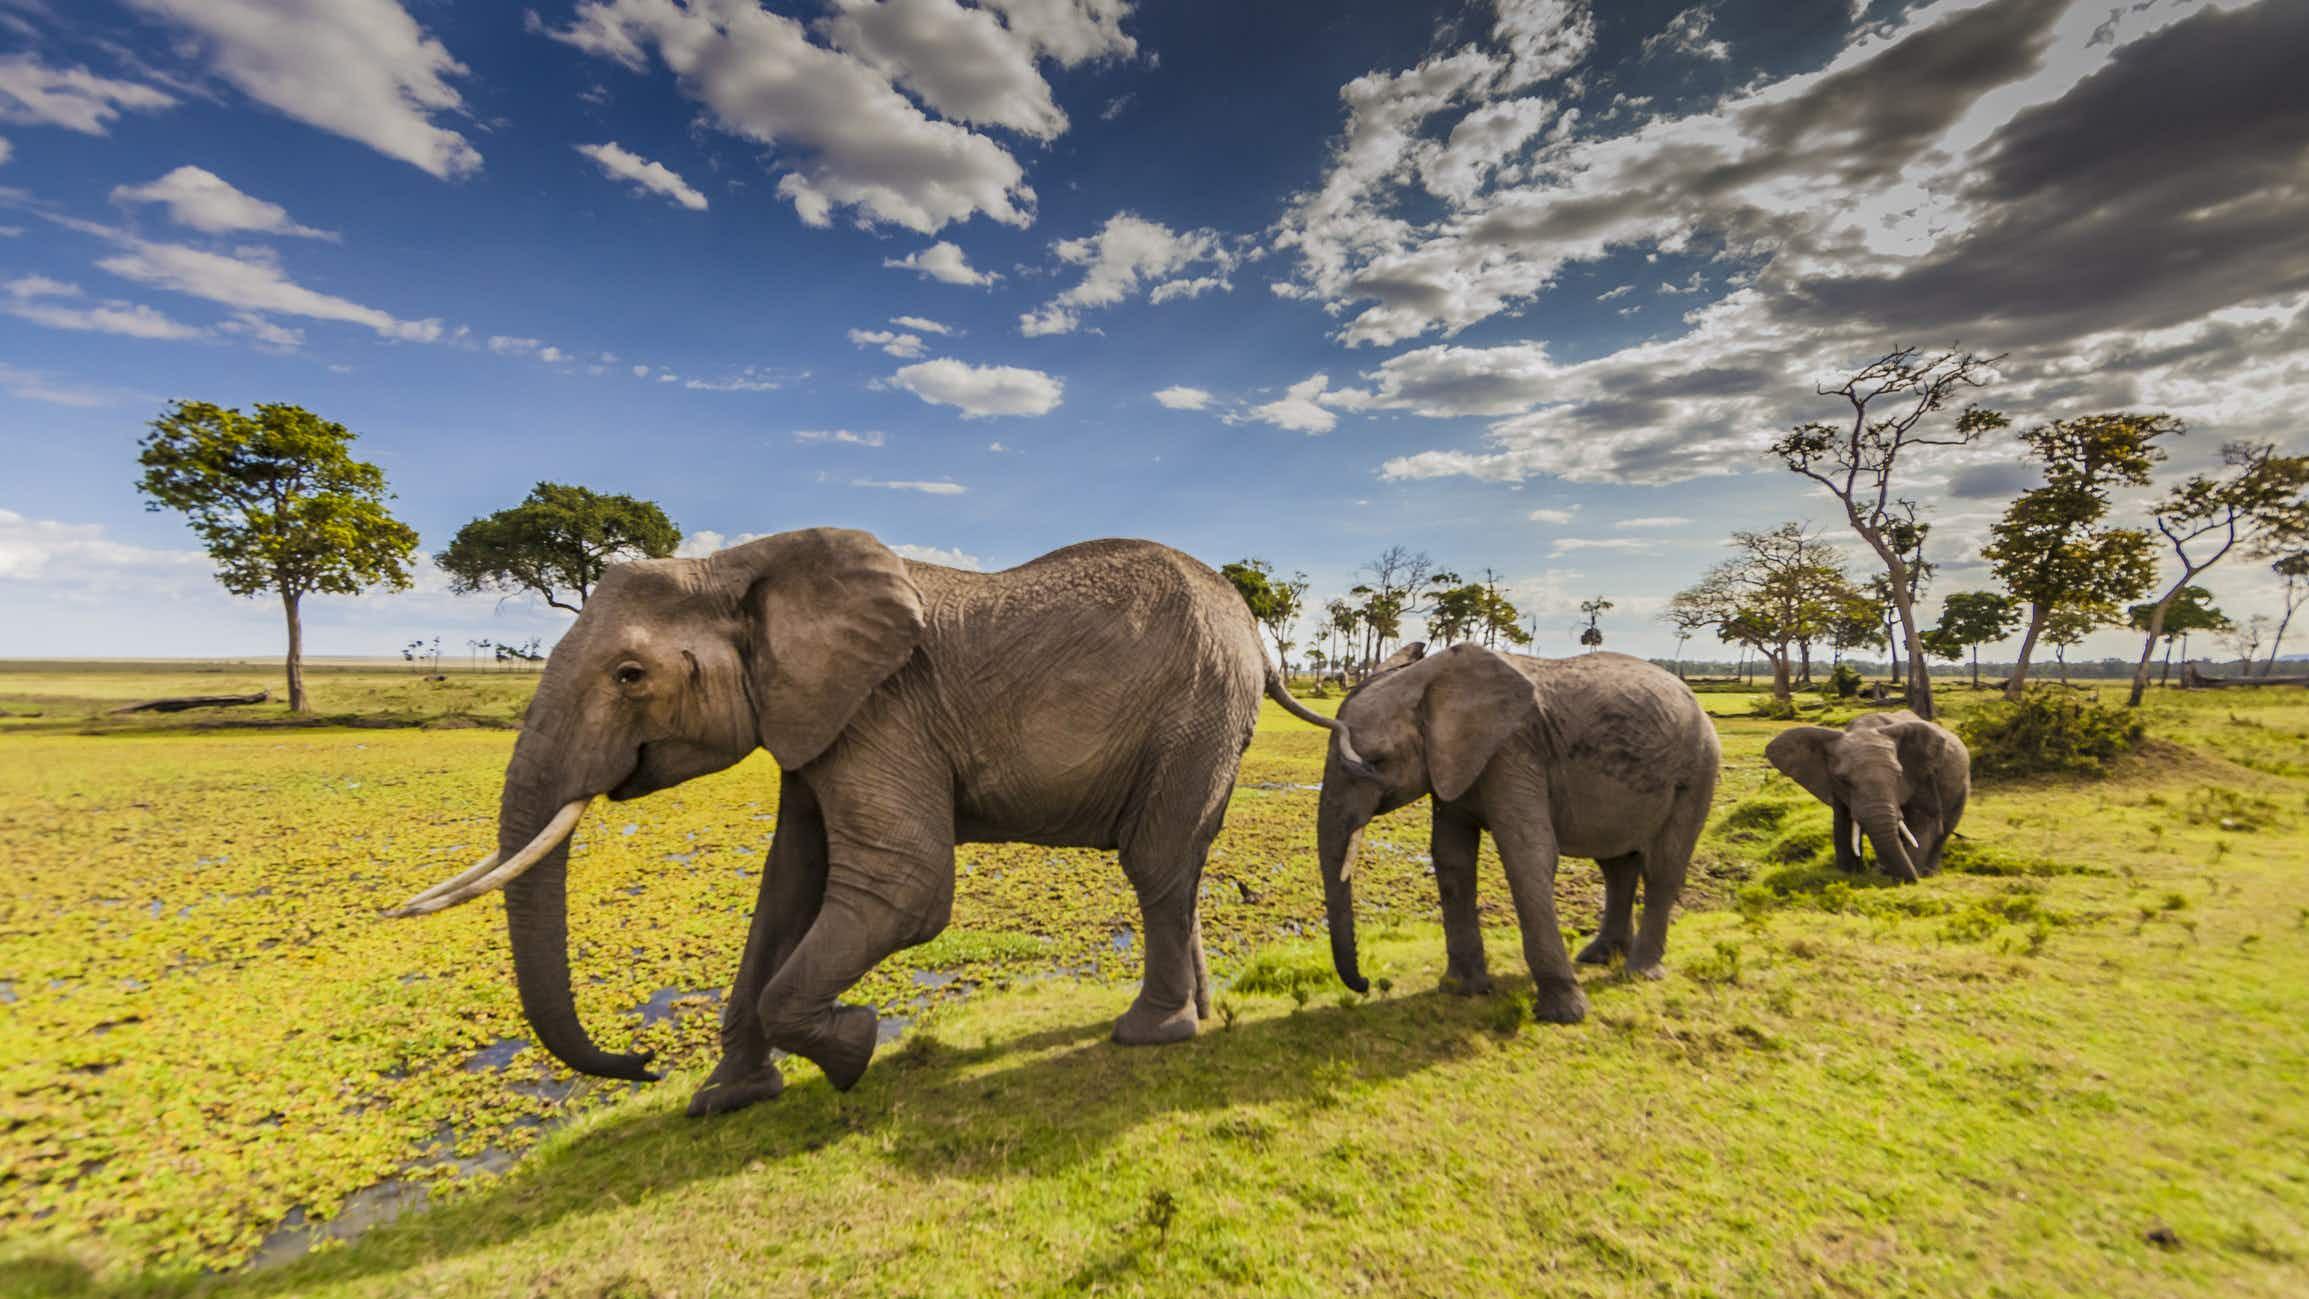 The elephant population in Kenya's Masai Mara has risen dramatically